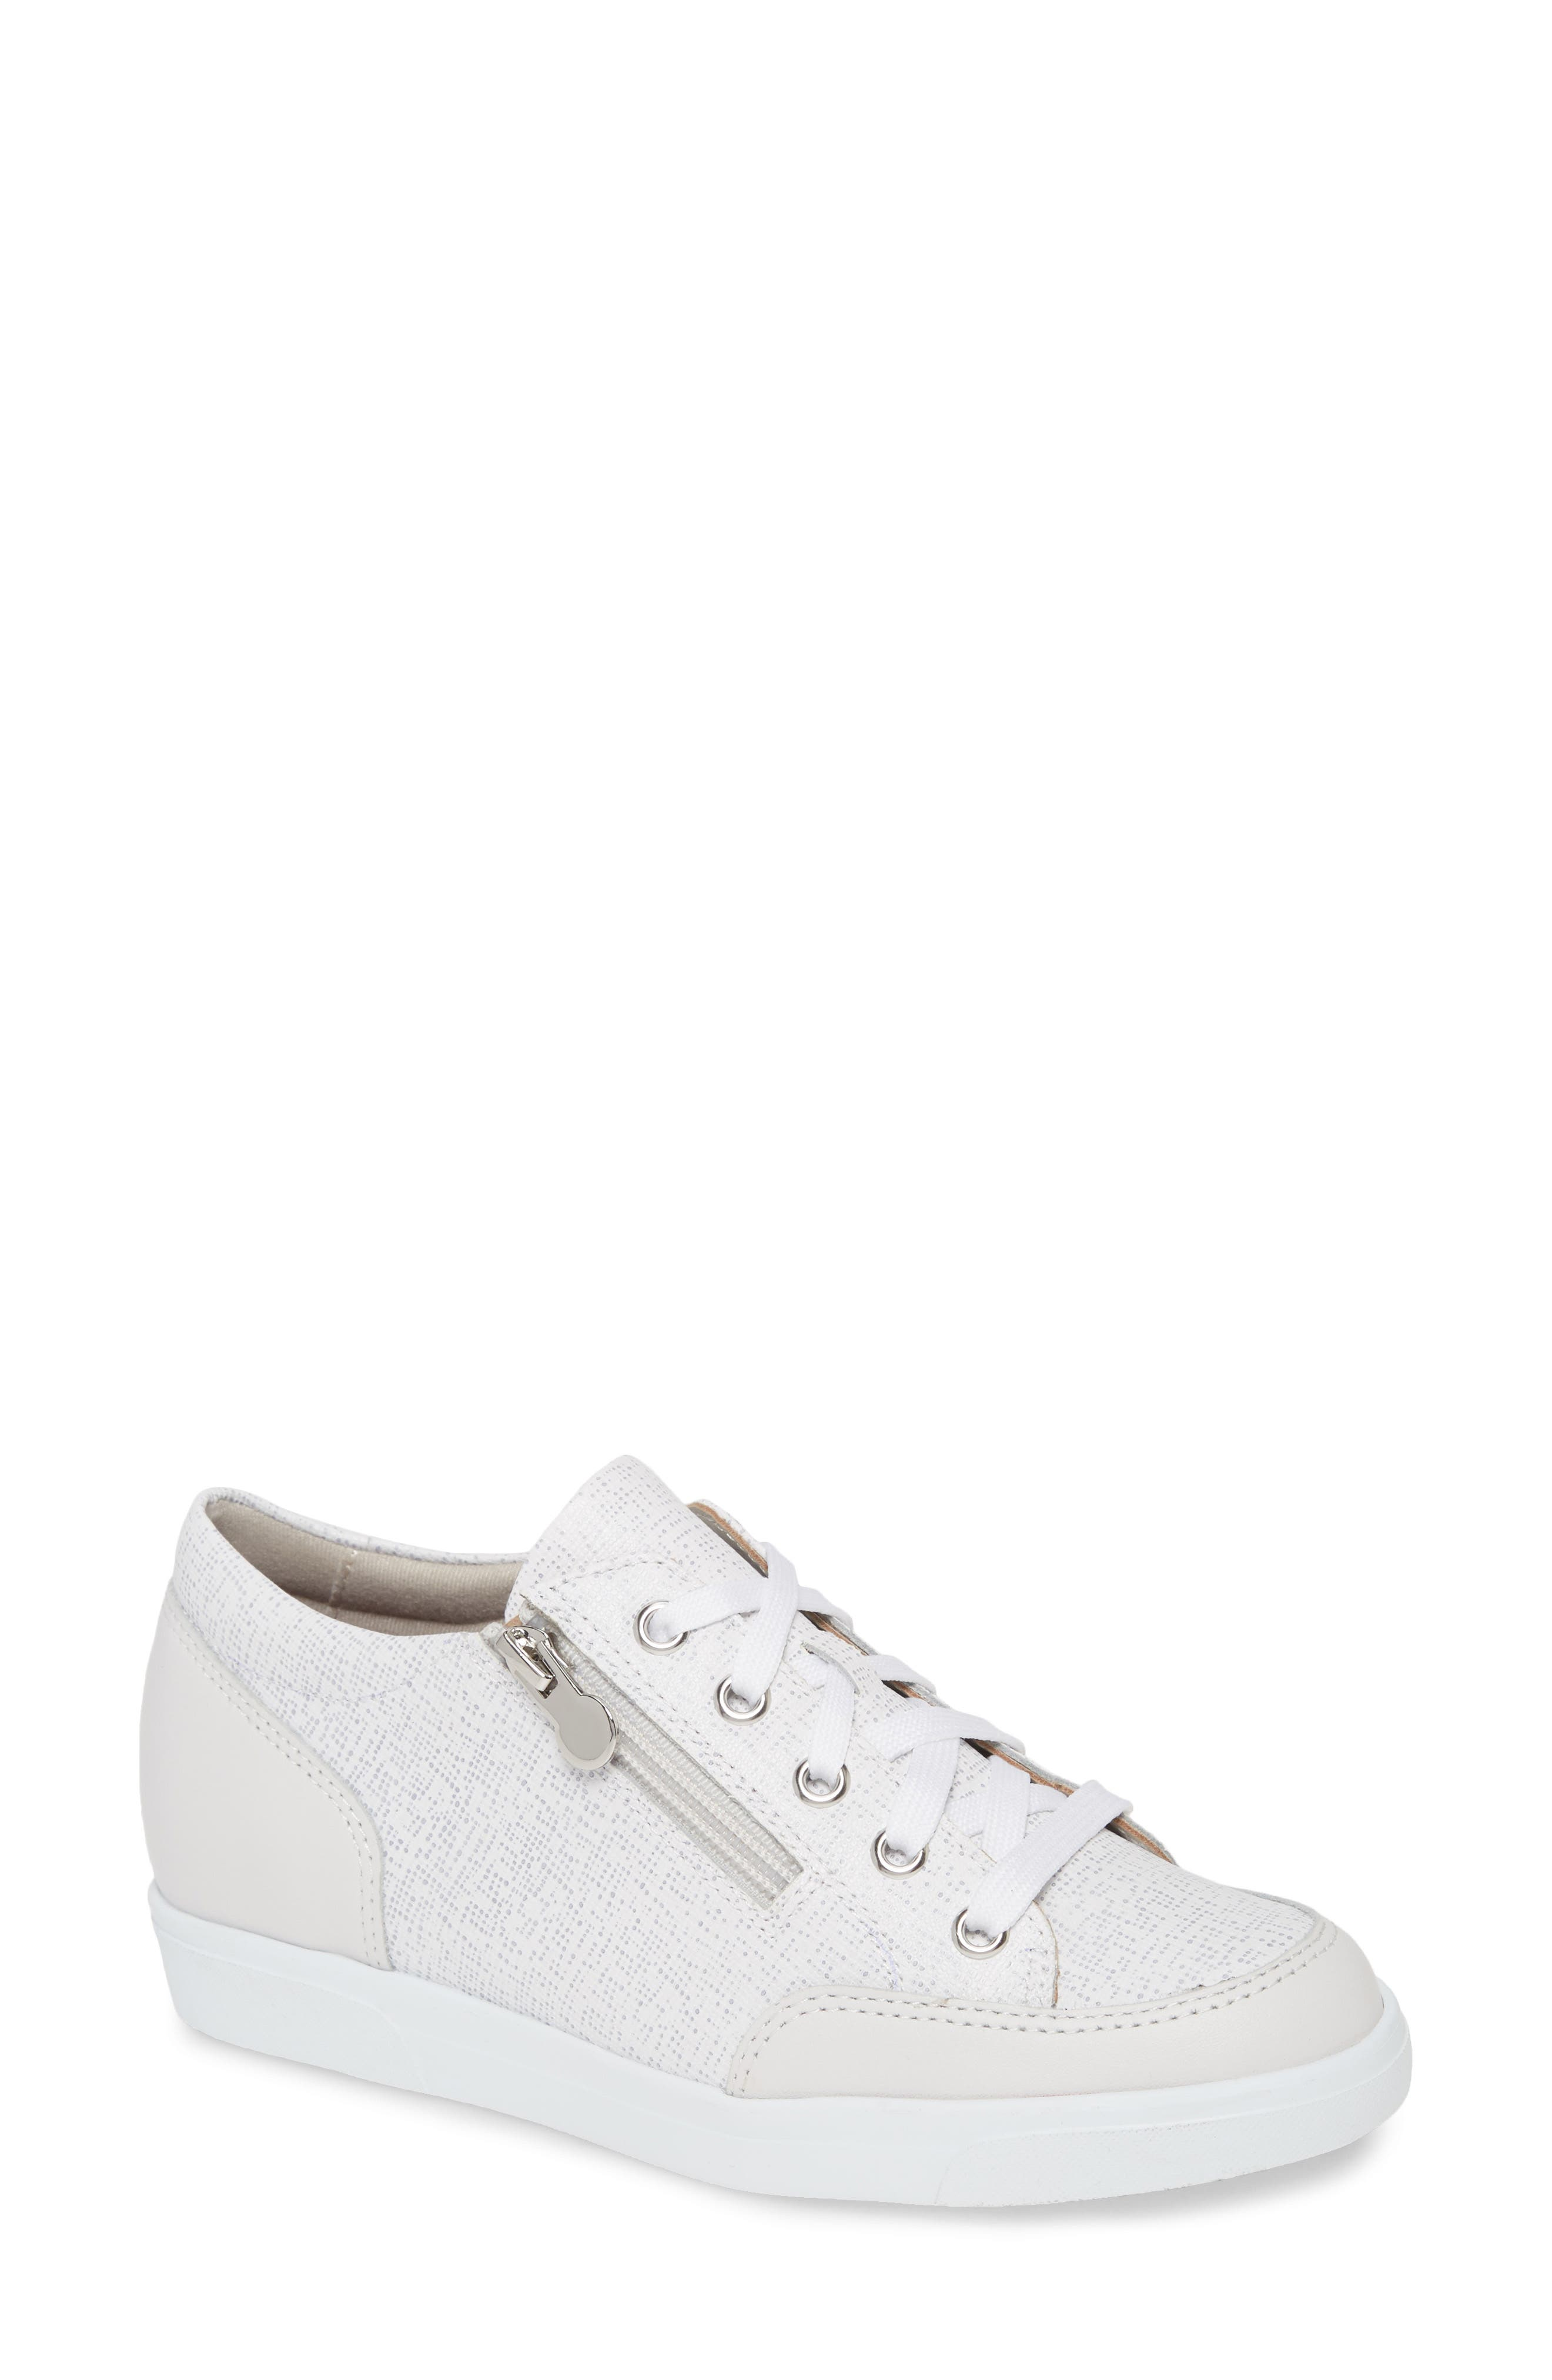 Women's Munro Shoes Sale \u0026 Clearance